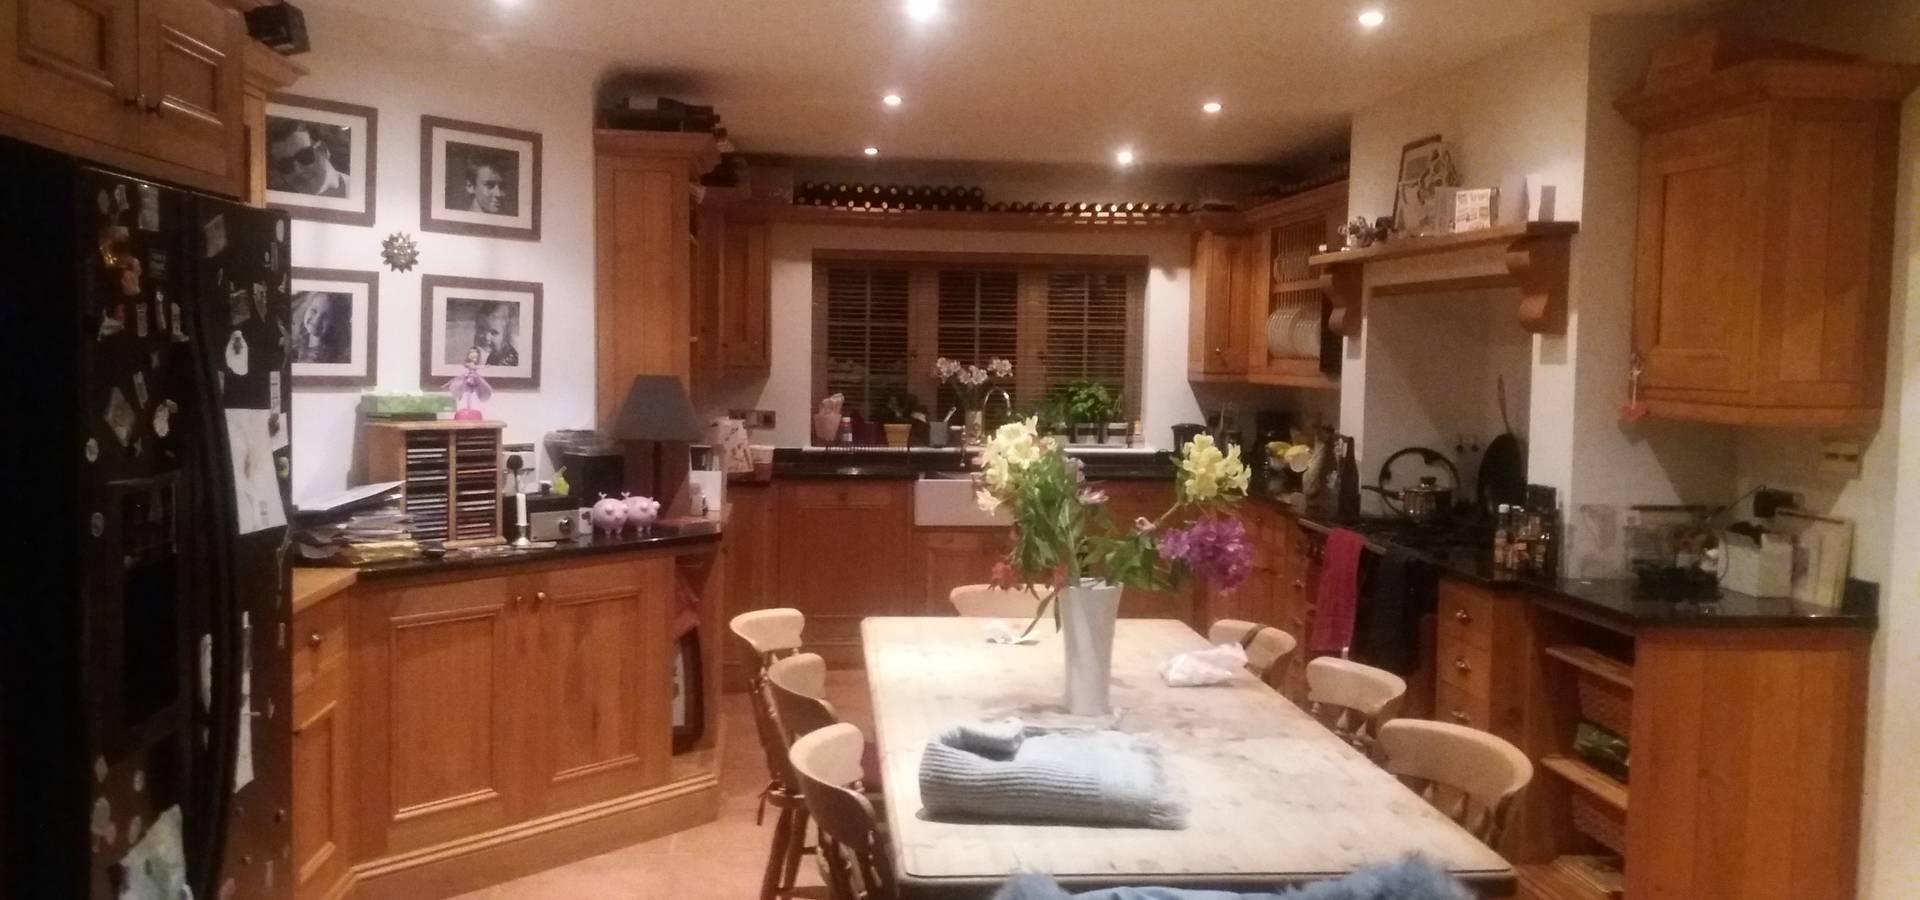 Kitchens of Surrey